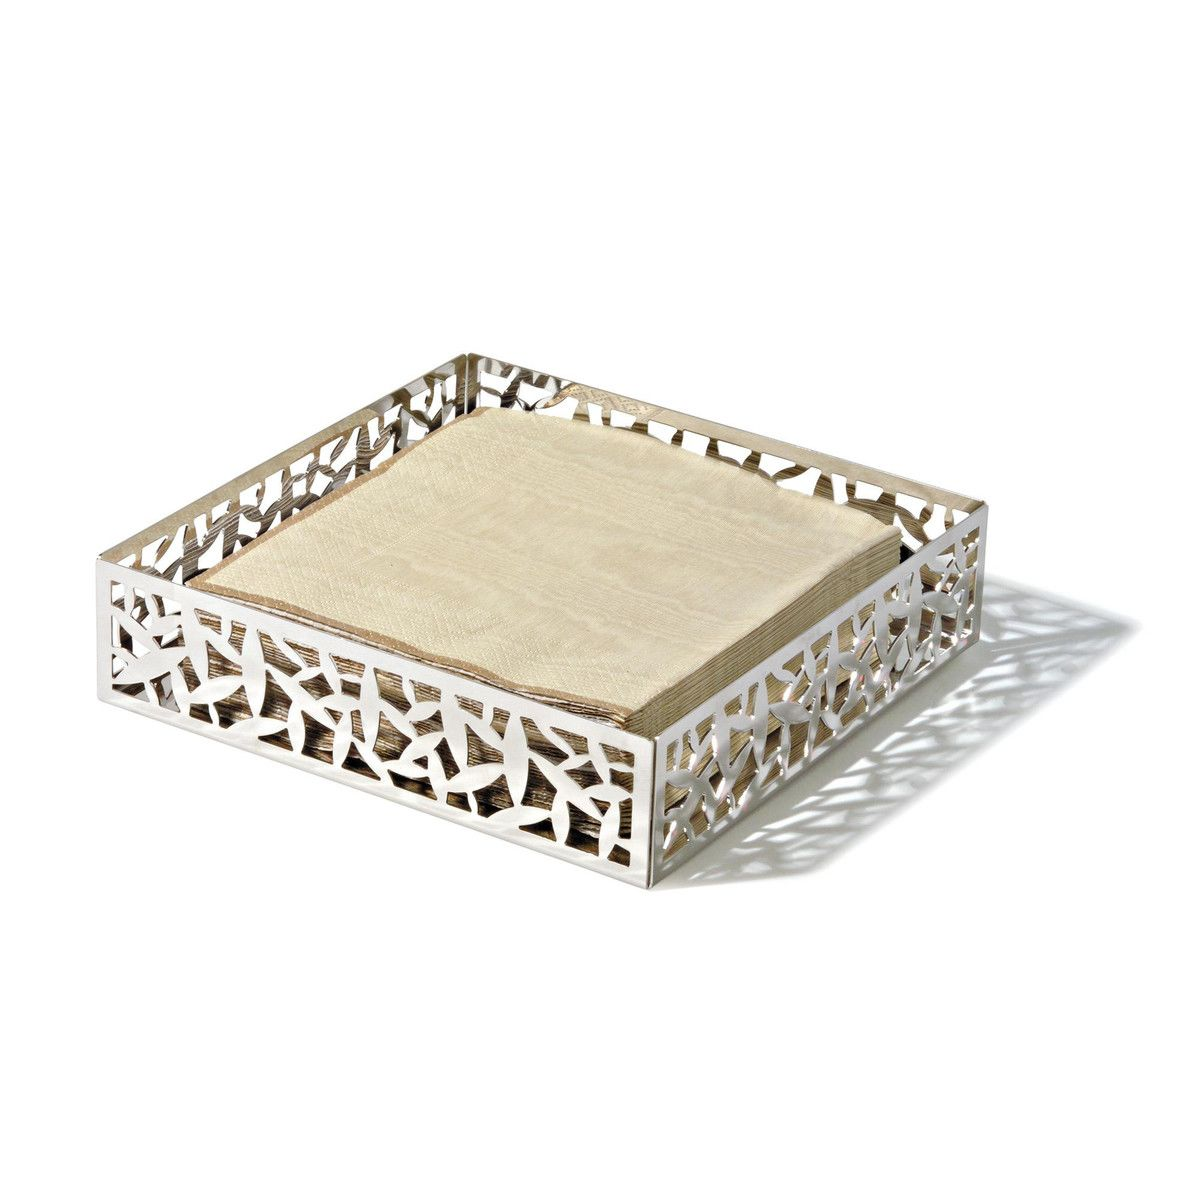 Cactus porte serviettes de table alessi serviettes - Porte serviettes de table ...